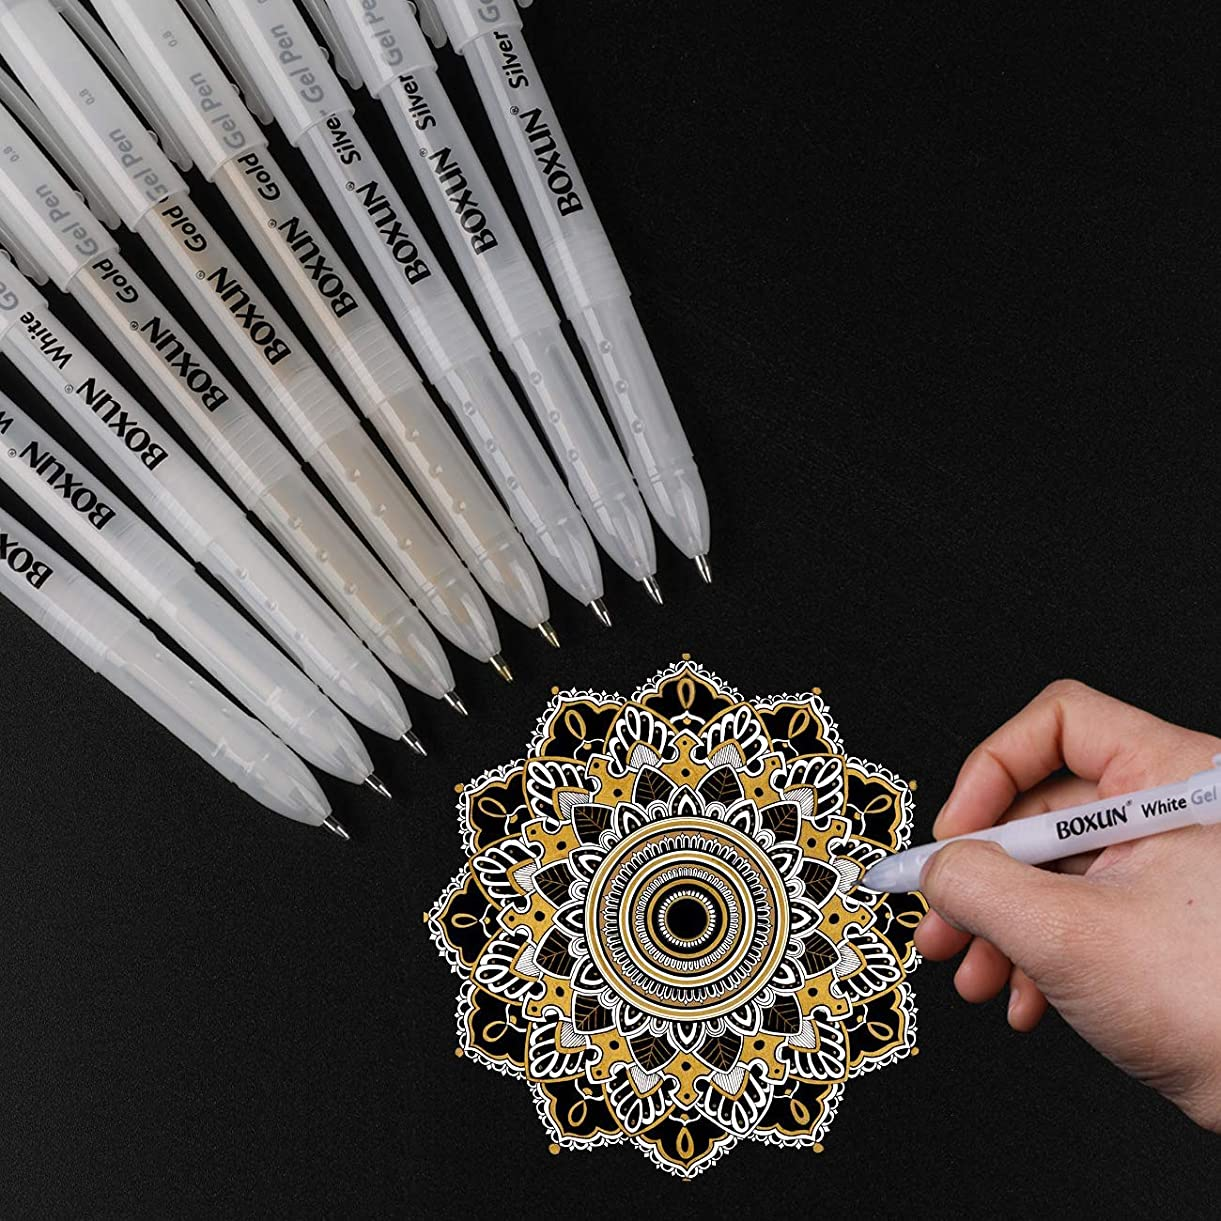 White, Gold and Silver Gel Pen Set for Artist - 3 Colors (9 Pack) Gel Ink Pens for Black Paper Drawing, Sketching, Manga, Illustration jtpcy6025